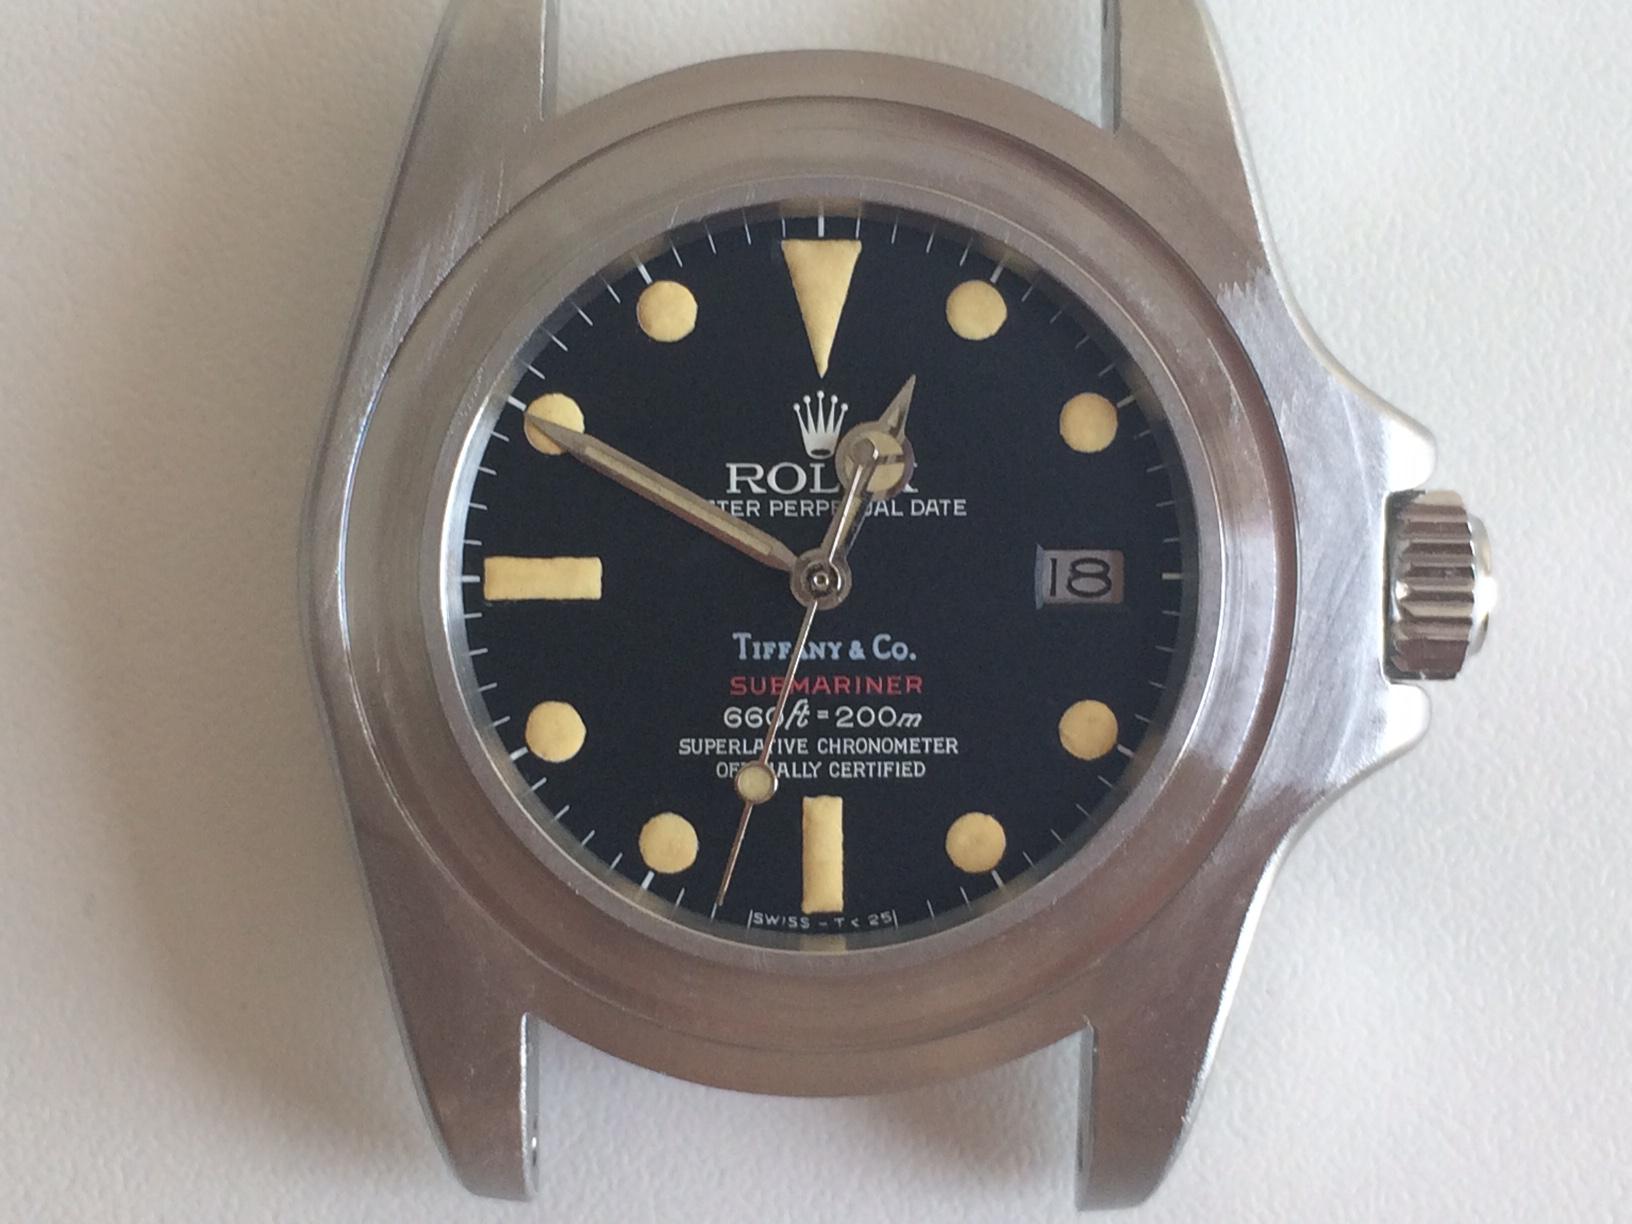 ROLEX Red Submariner 1680 Tiffany - Ιδιοκατασκευές